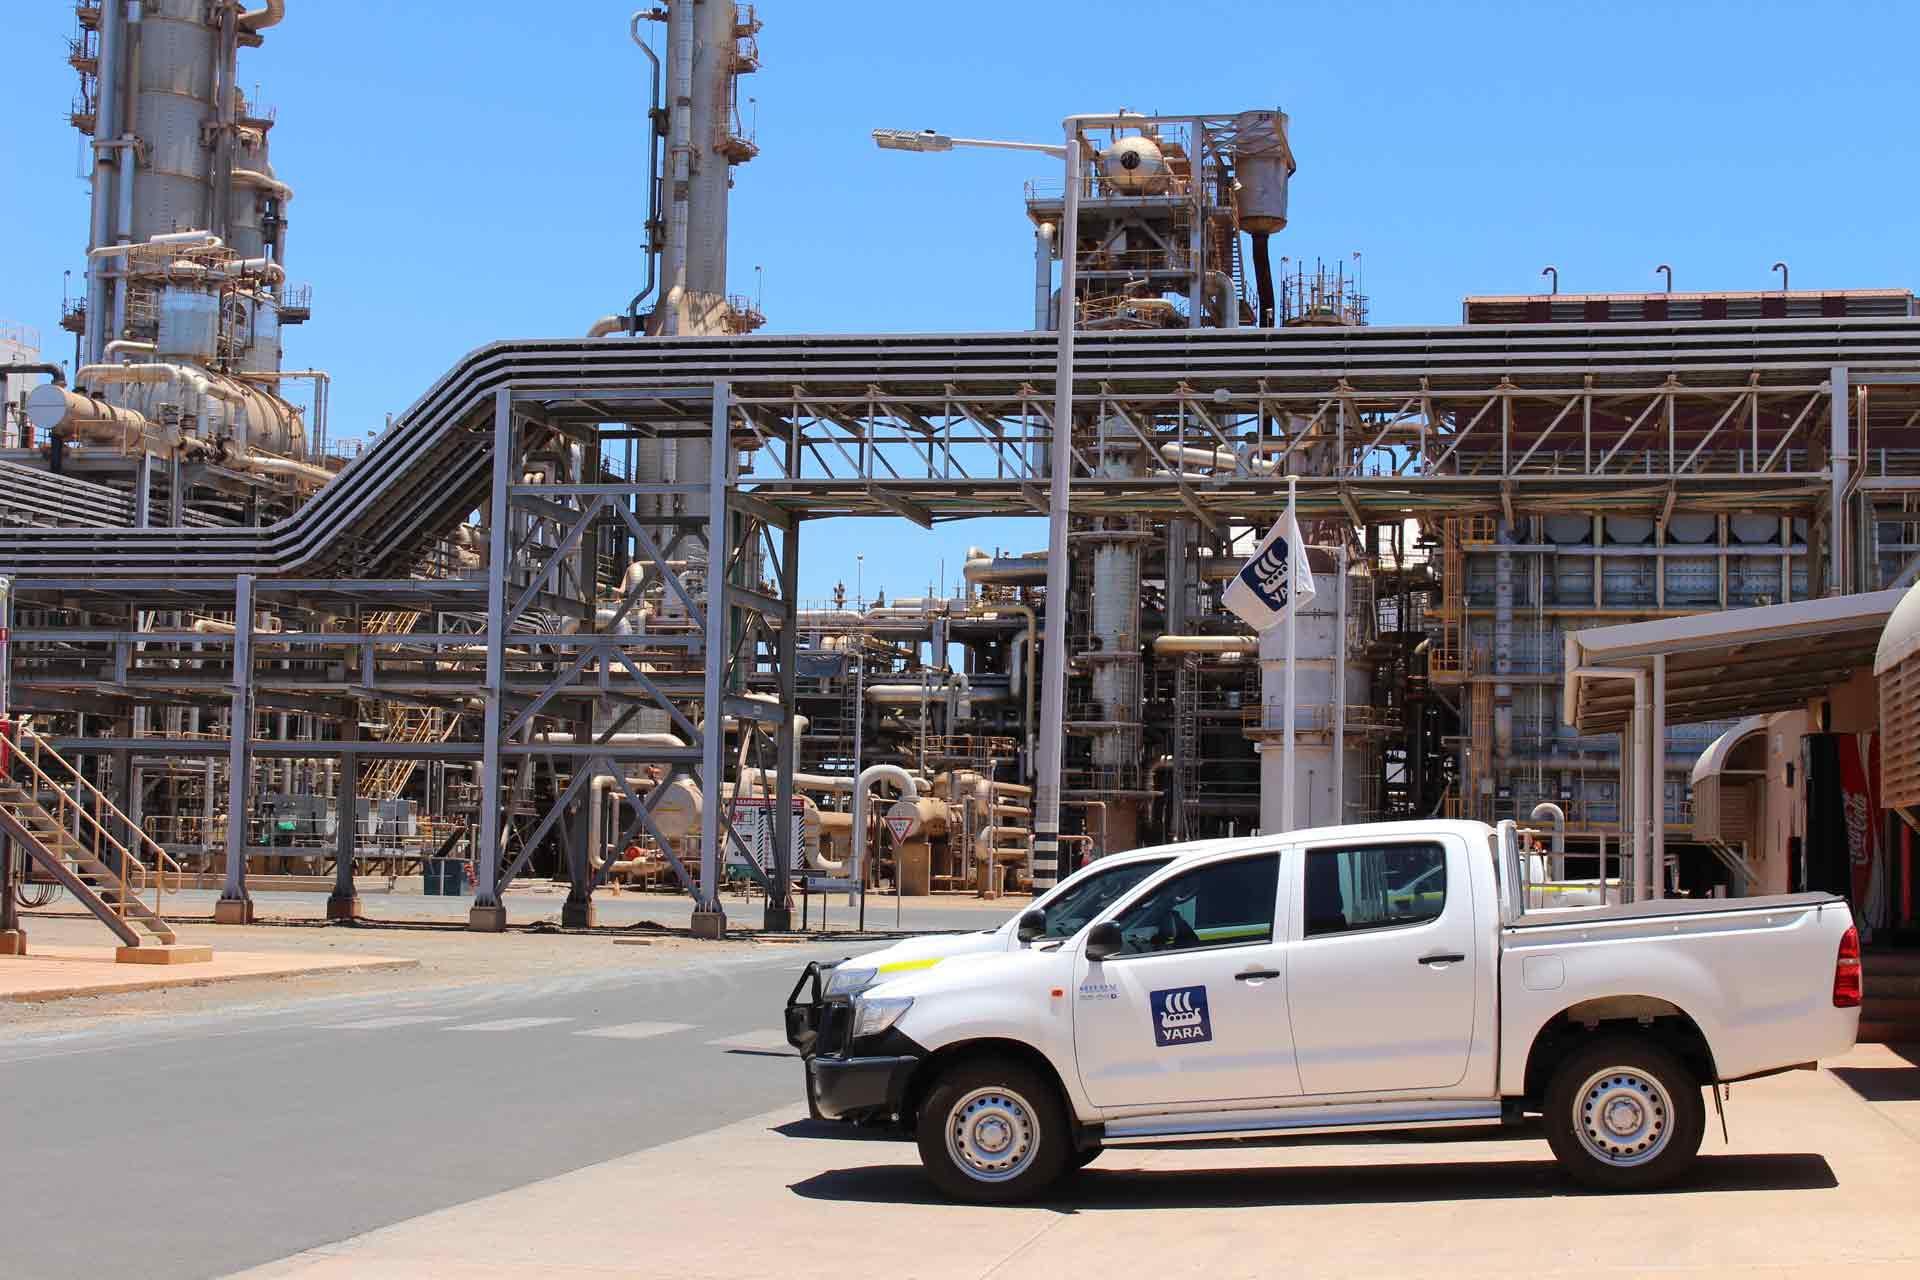 Image - Yara's ammonia plant in Western Australia's Pilbara region